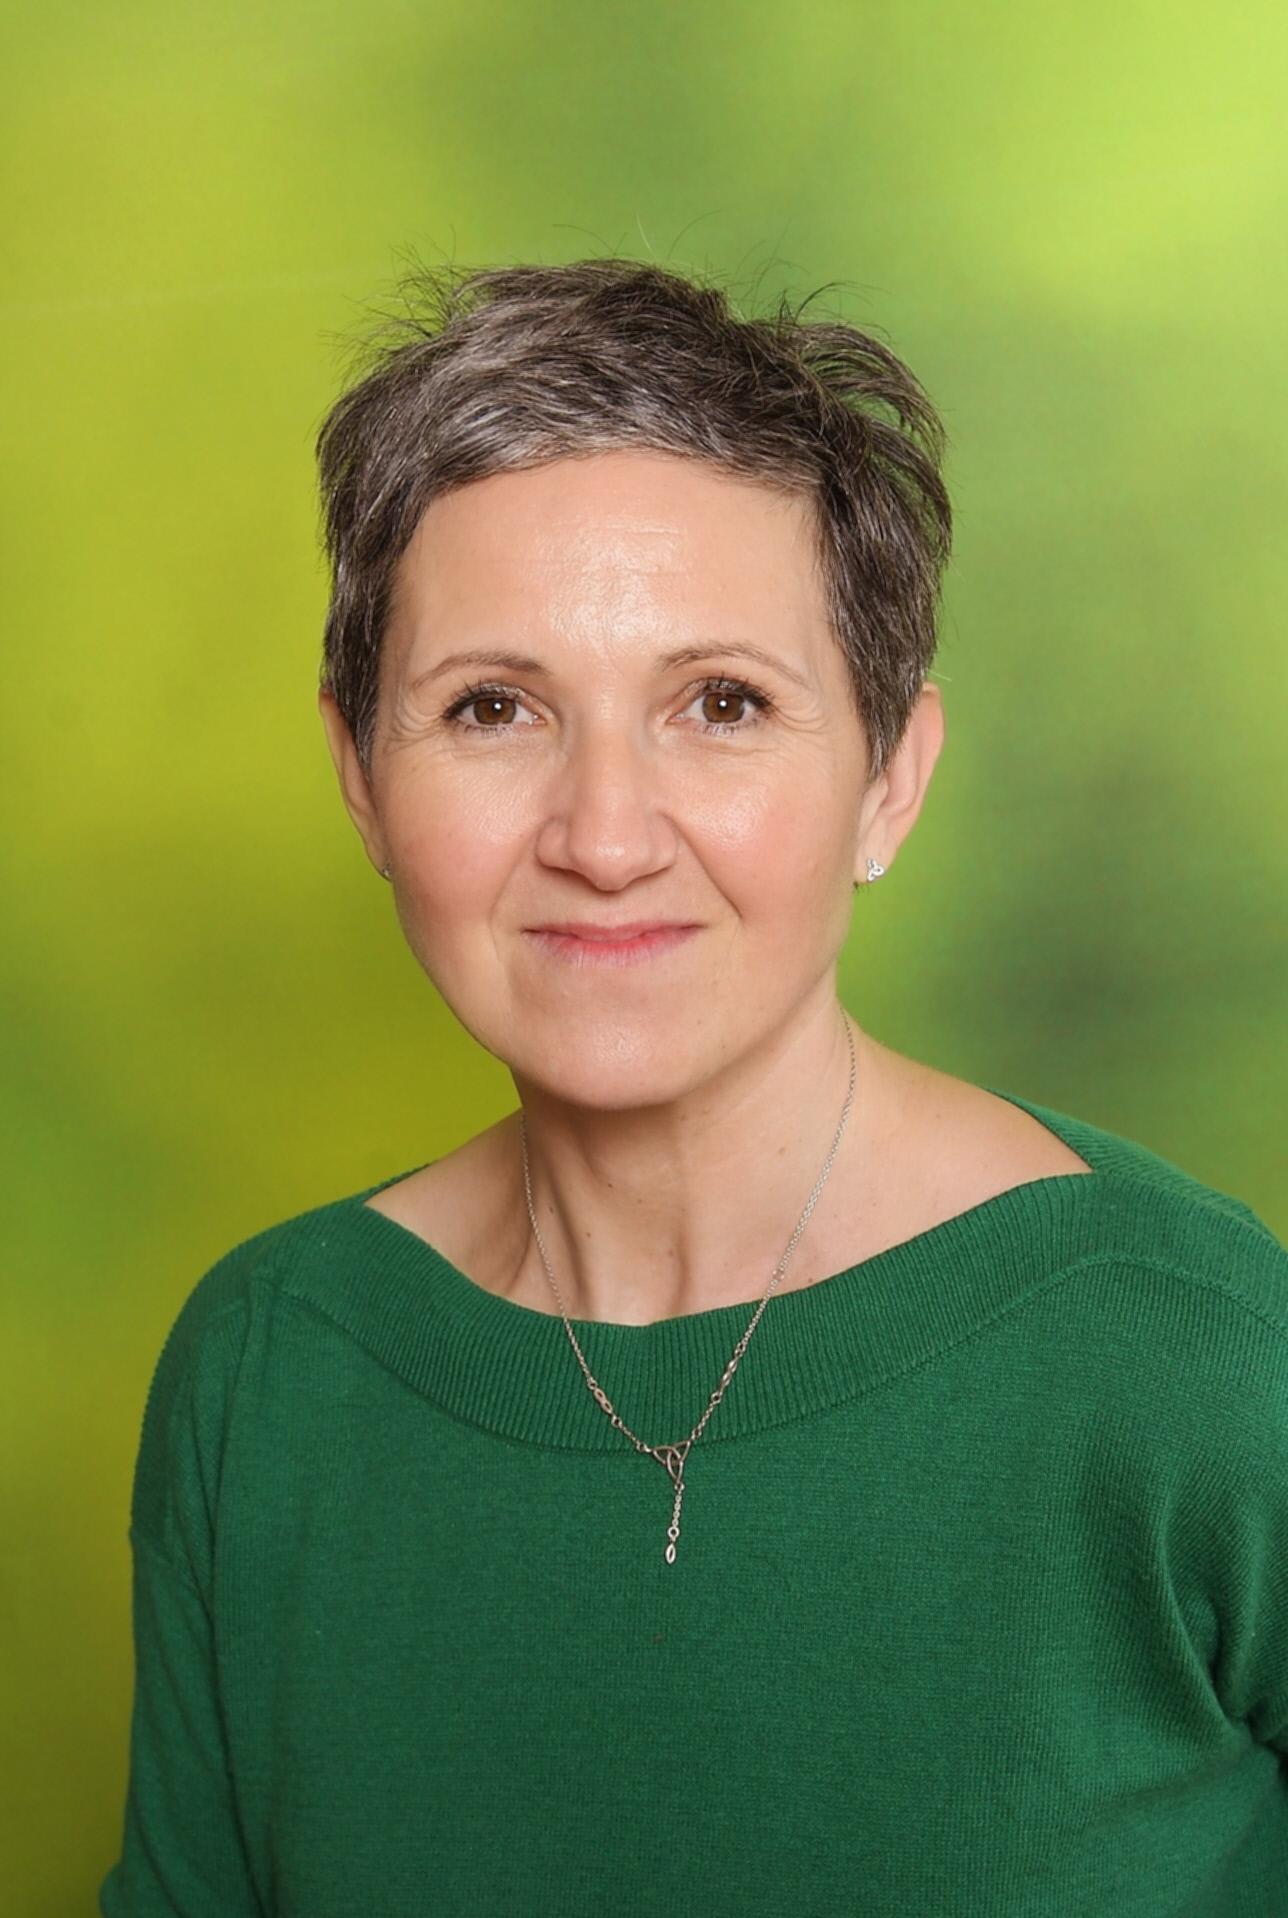 Gerti Krenn